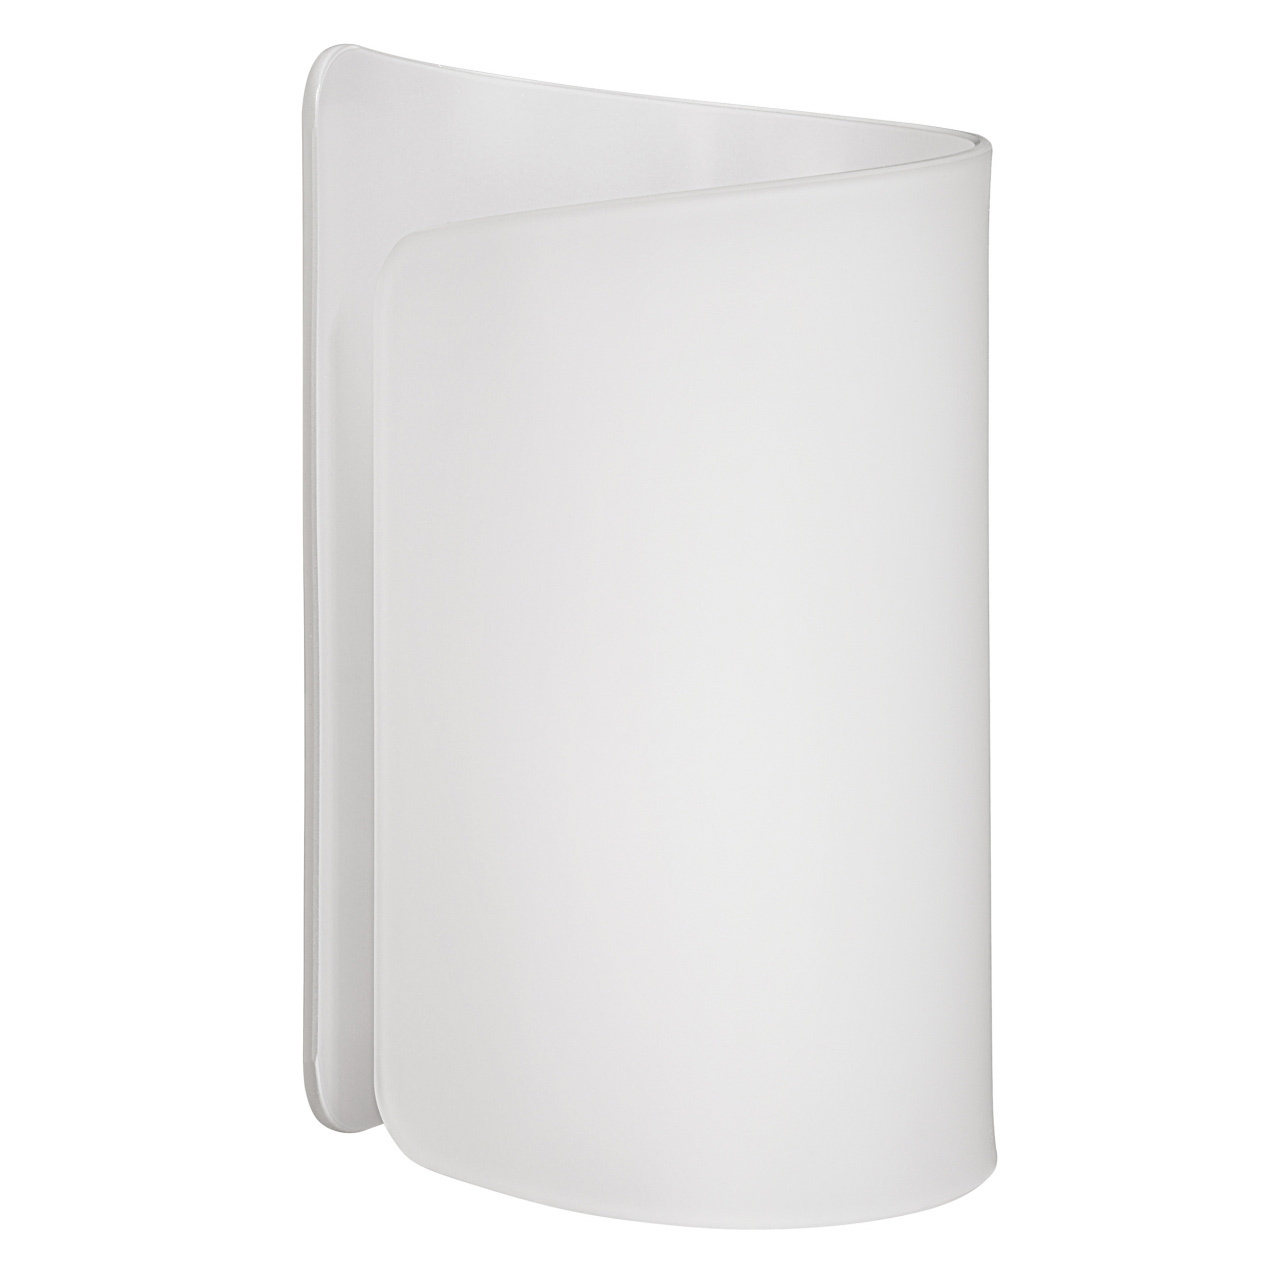 Бра Pittore 1х40W E27 белый Lightstar 811610